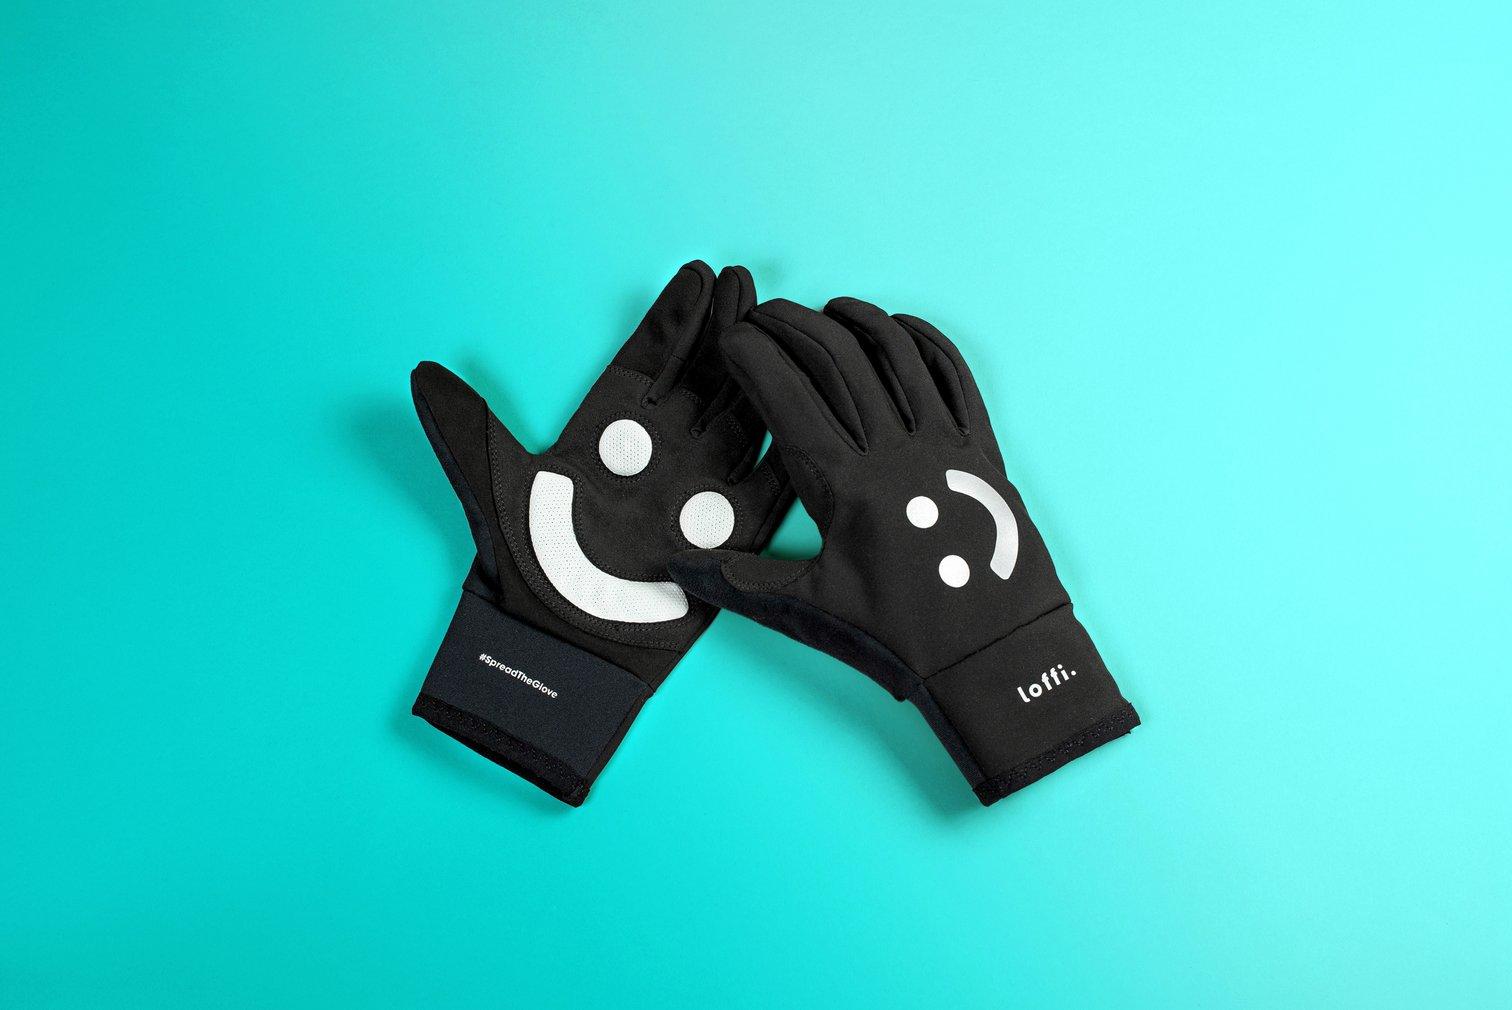 loffi_gloves.jpg